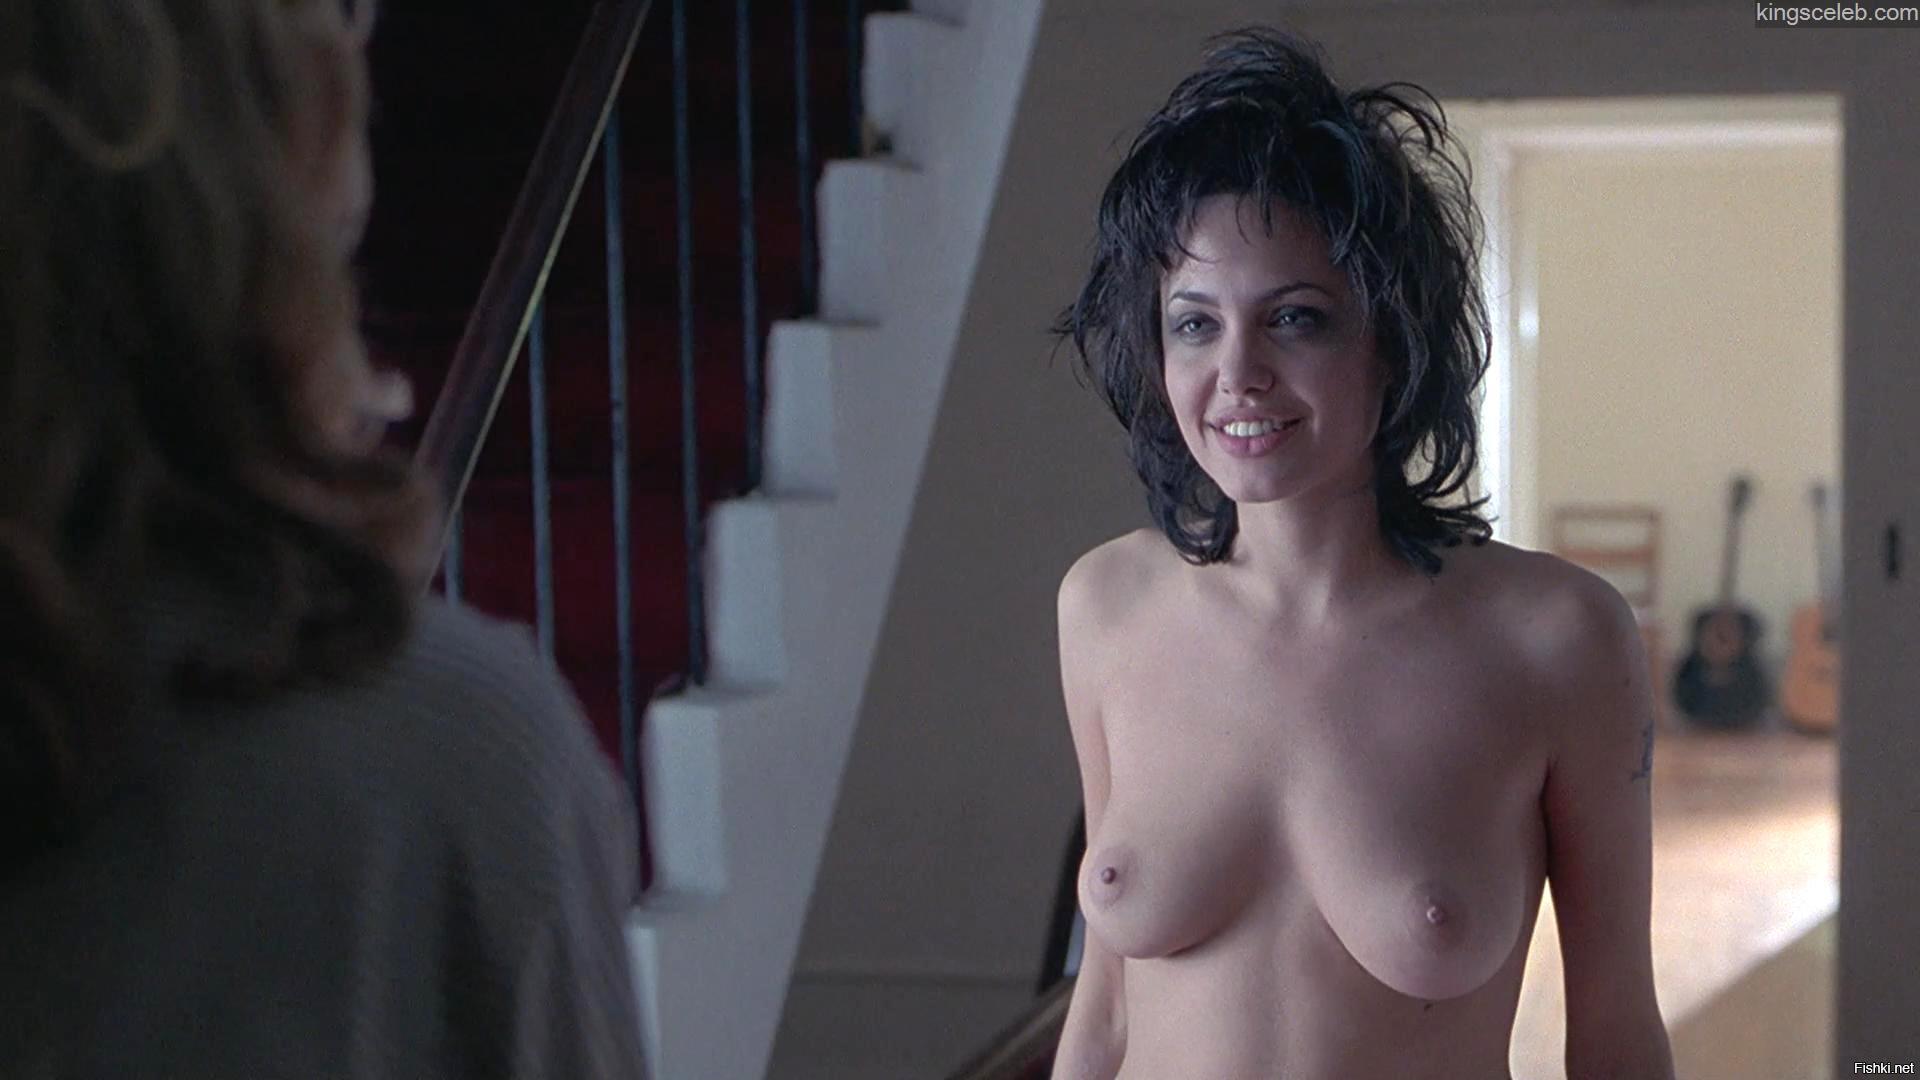 Stars naked movie — photo 9